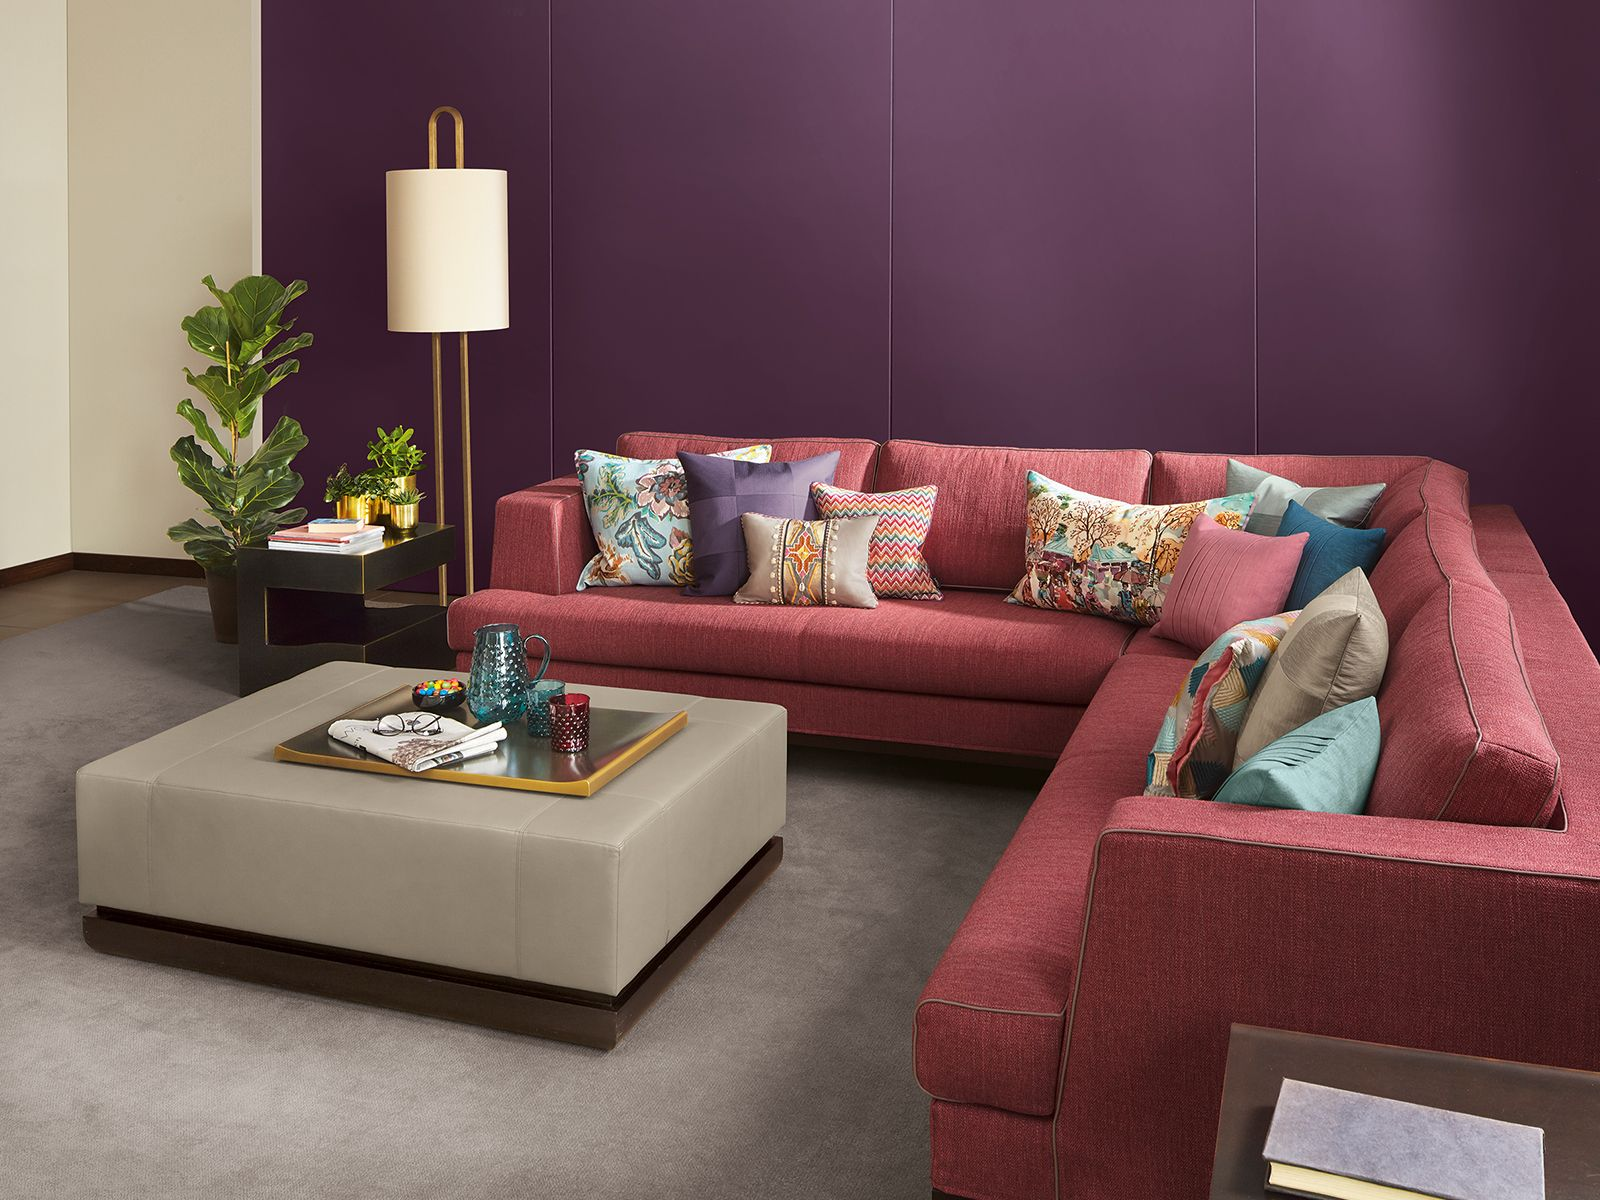 cushion, sofa FAMILY, colourful, living room, lamp | CUSHIONS ...